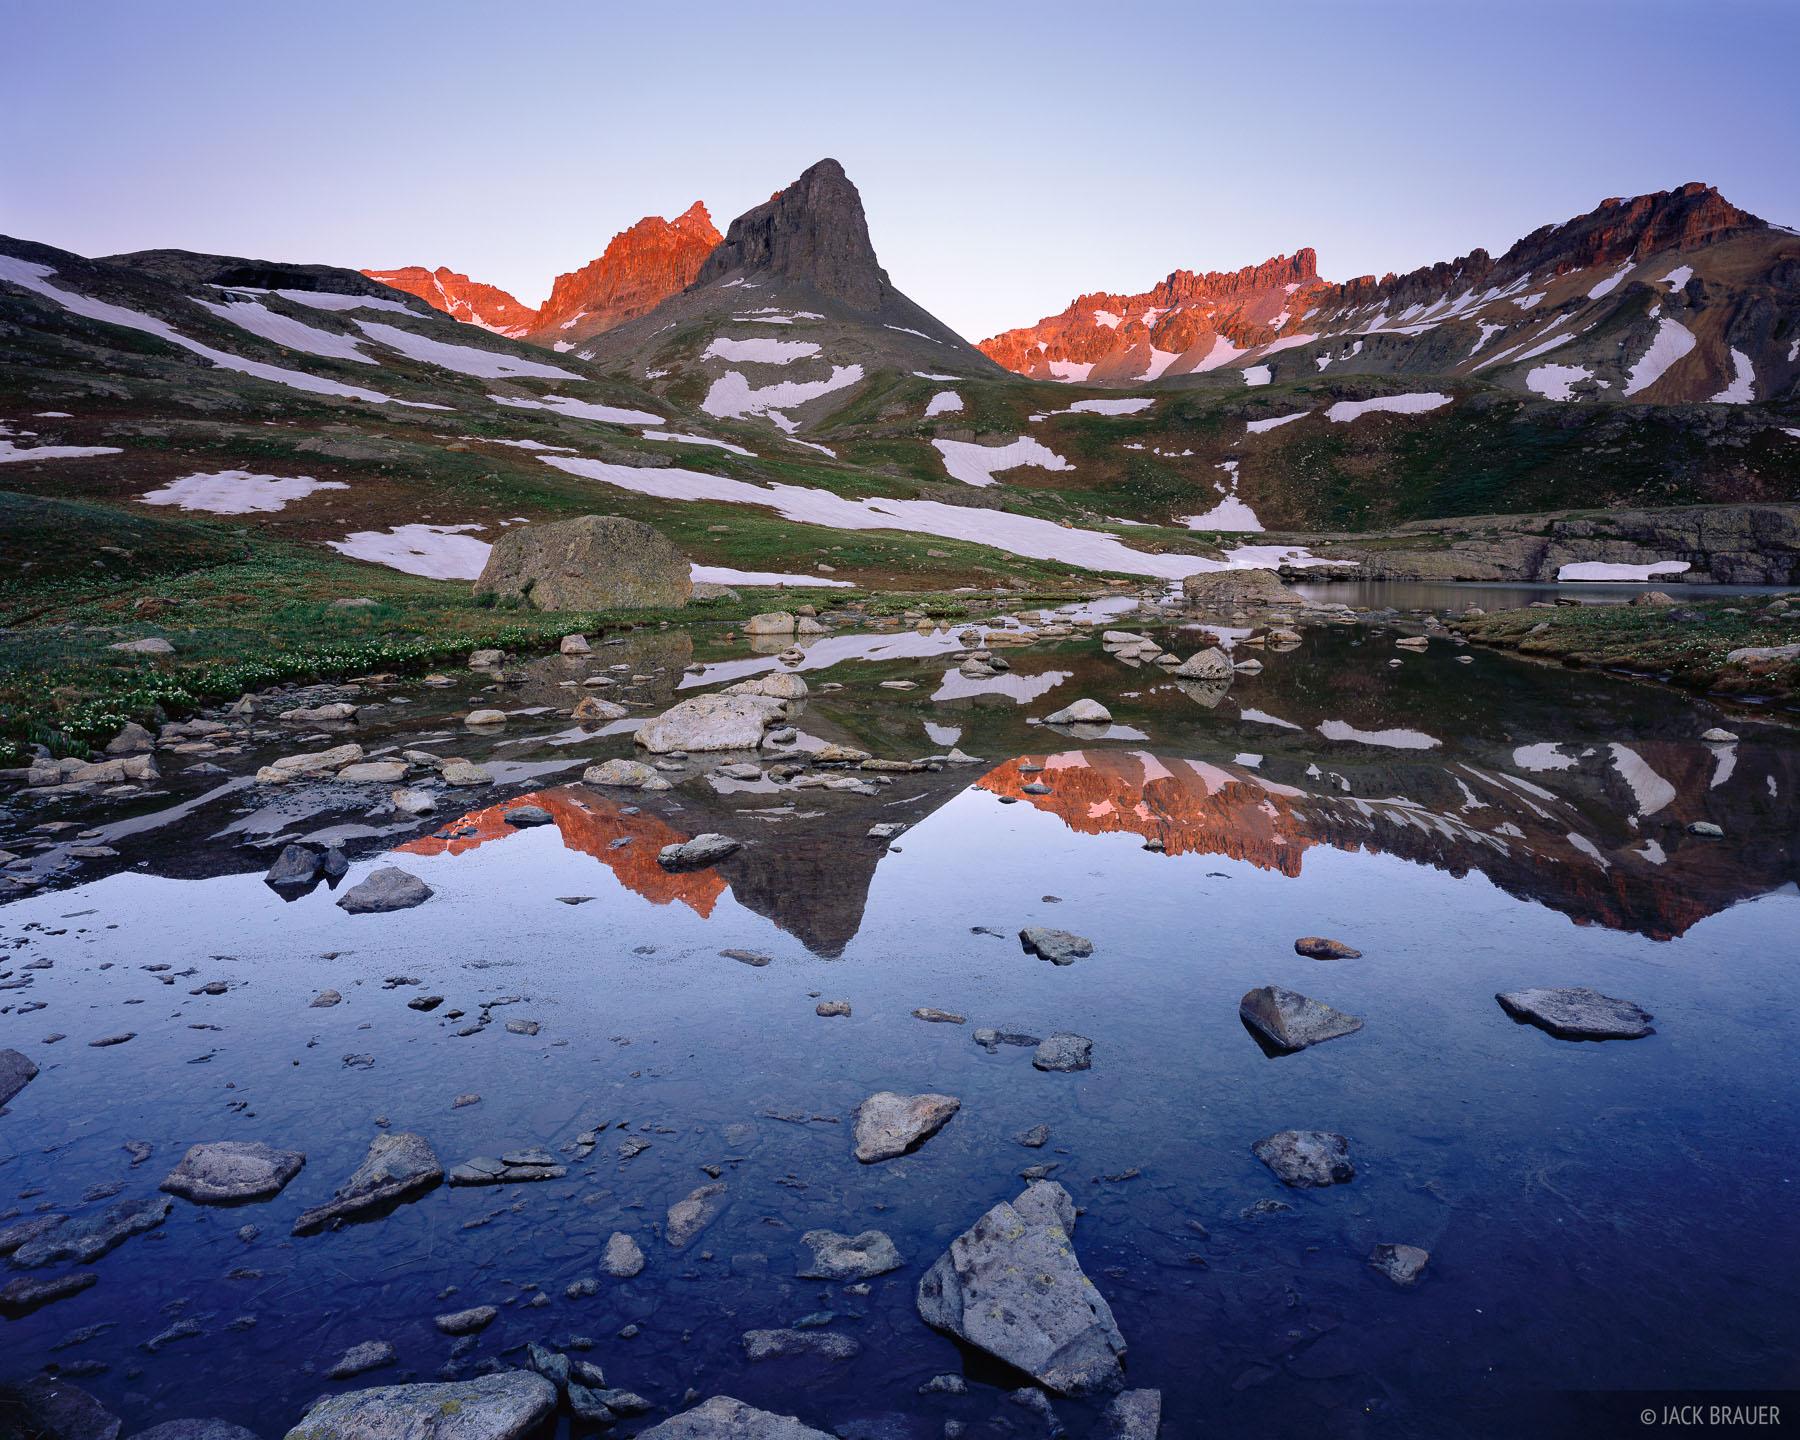 Ice Lakes Basin, reflection, San Juan Mountains, Colorado, photo